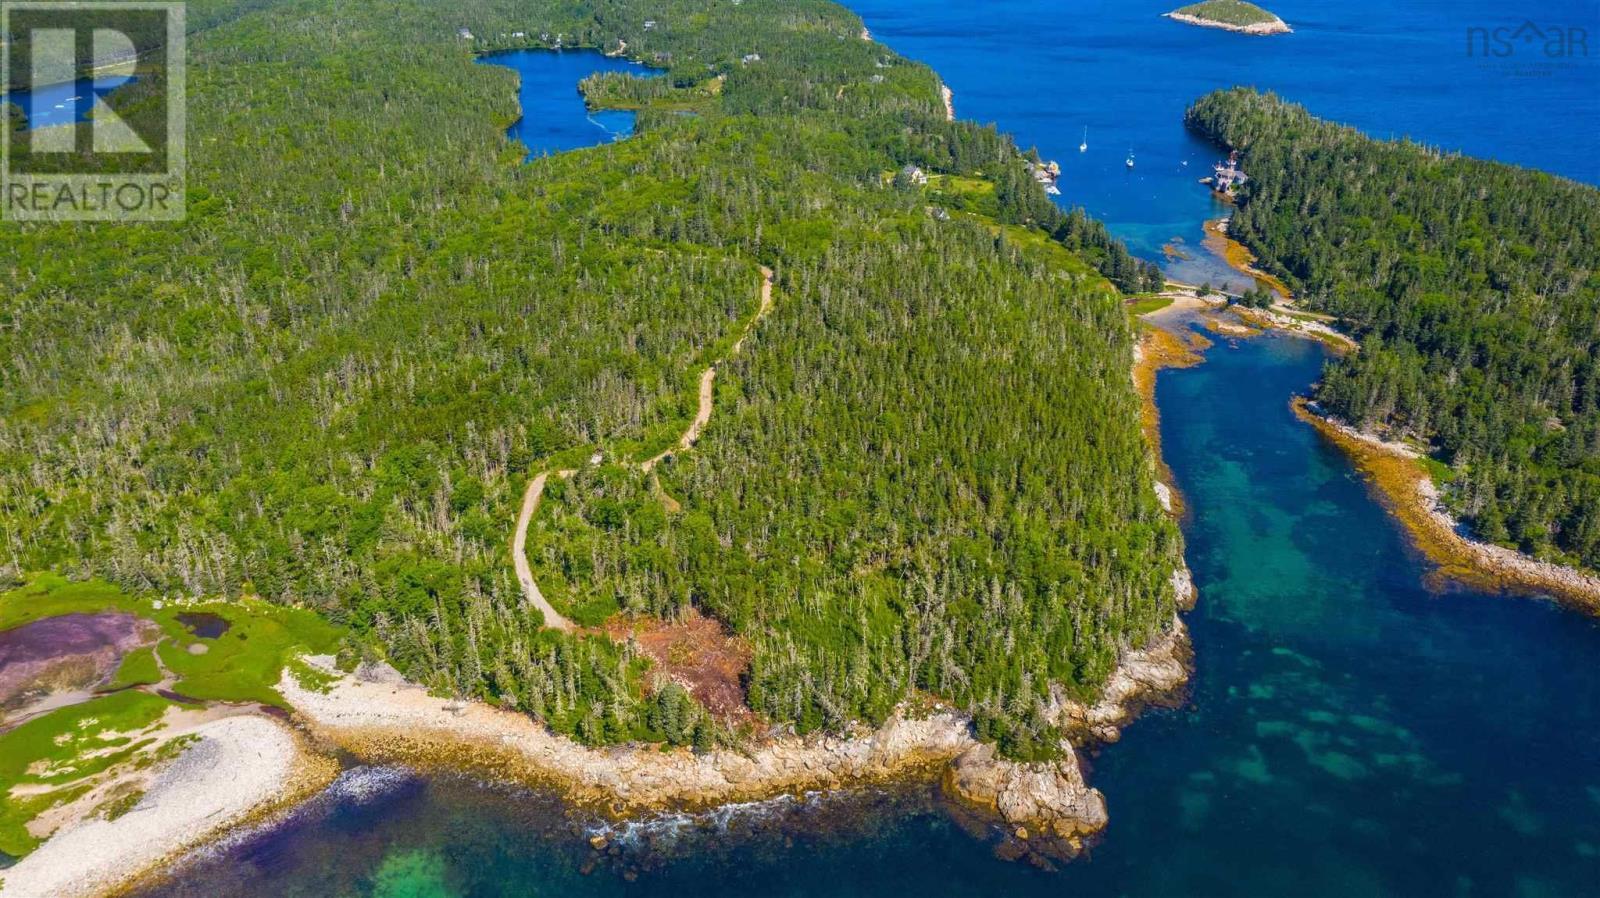 Lot W20-4 Owls Head Drive, Southwest Cove, Nova Scotia  B0J 1T0 - Photo 2 - 202125697